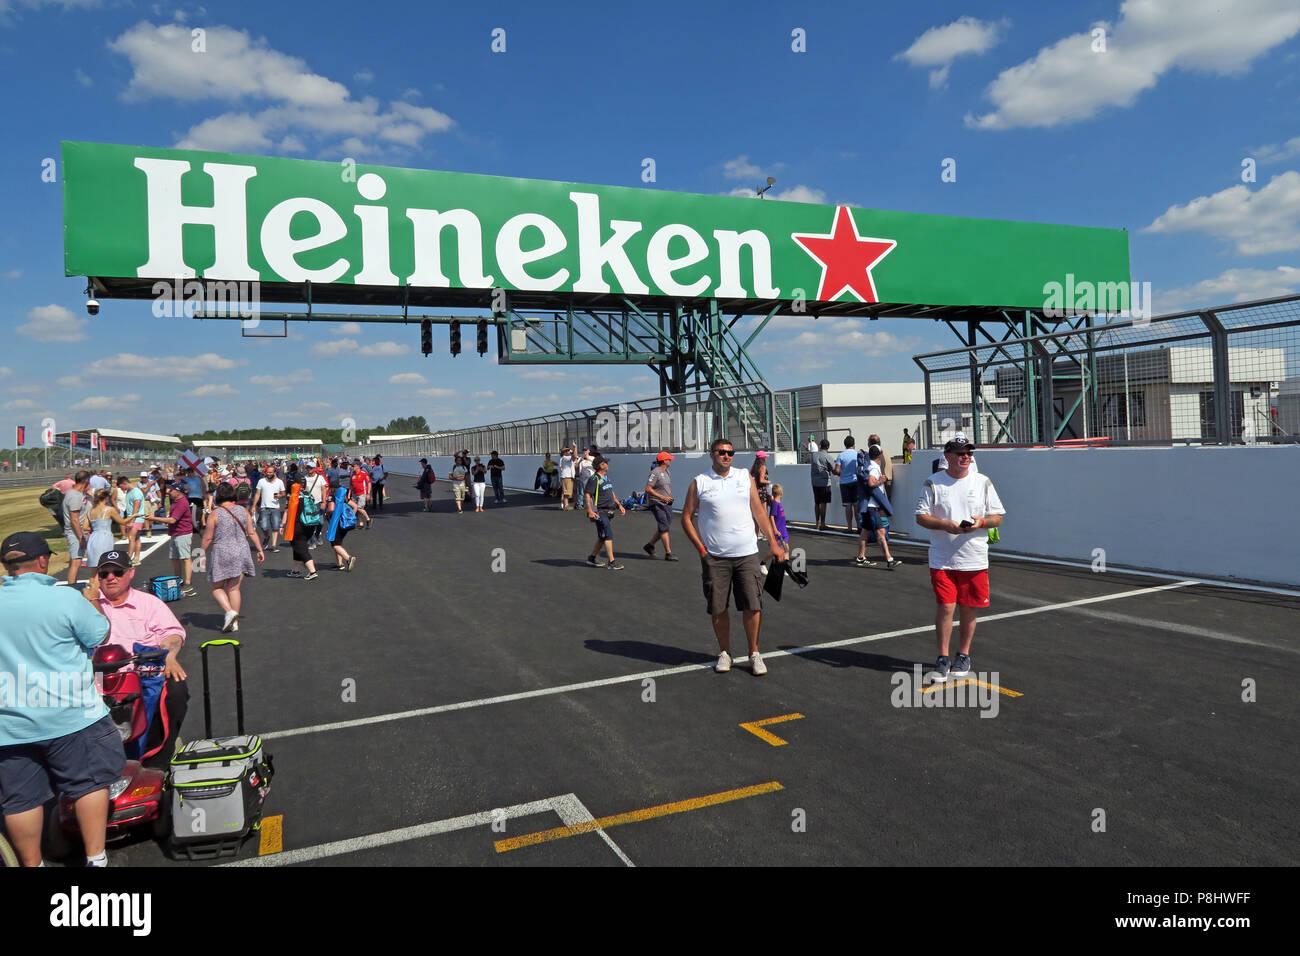 @HotpixUK,GoTonySmith,British GP 2018,car,track,spectators,spectator,the circuit,circuit,walk,Silverstone Circuit,F1,F1 Circuit,British,British Formula 1 Championship,British Grand Prix,GP,promotion,The British Grand Prix,trackside,Towcester,Northampton,England,UK,NN12 8TL